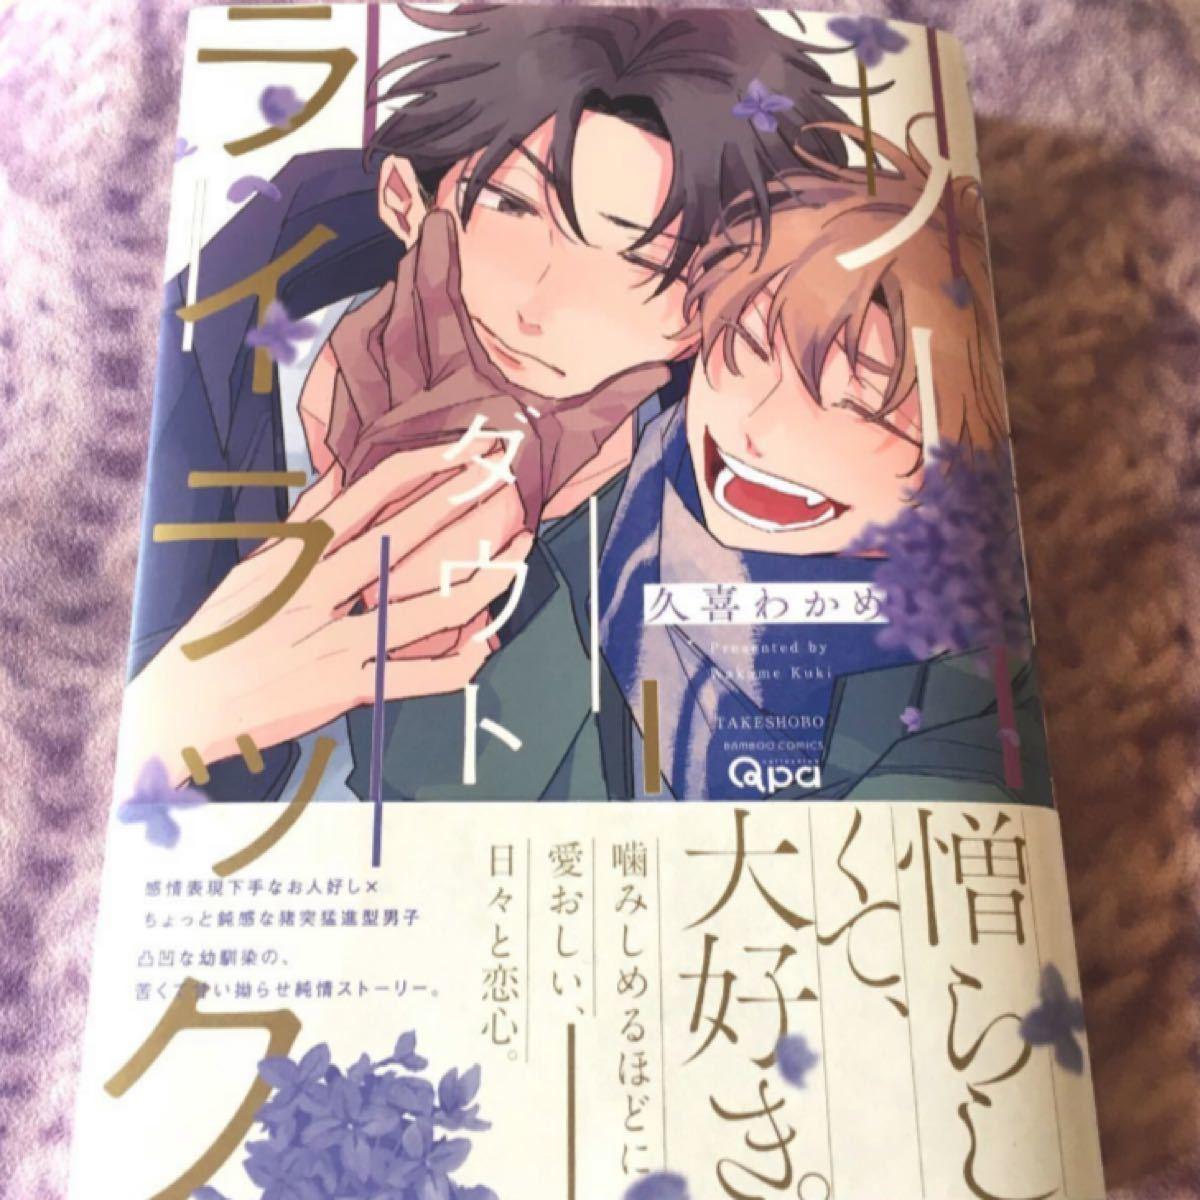 BL 漫画 コミック ノーダウトライラック  久喜わかめ